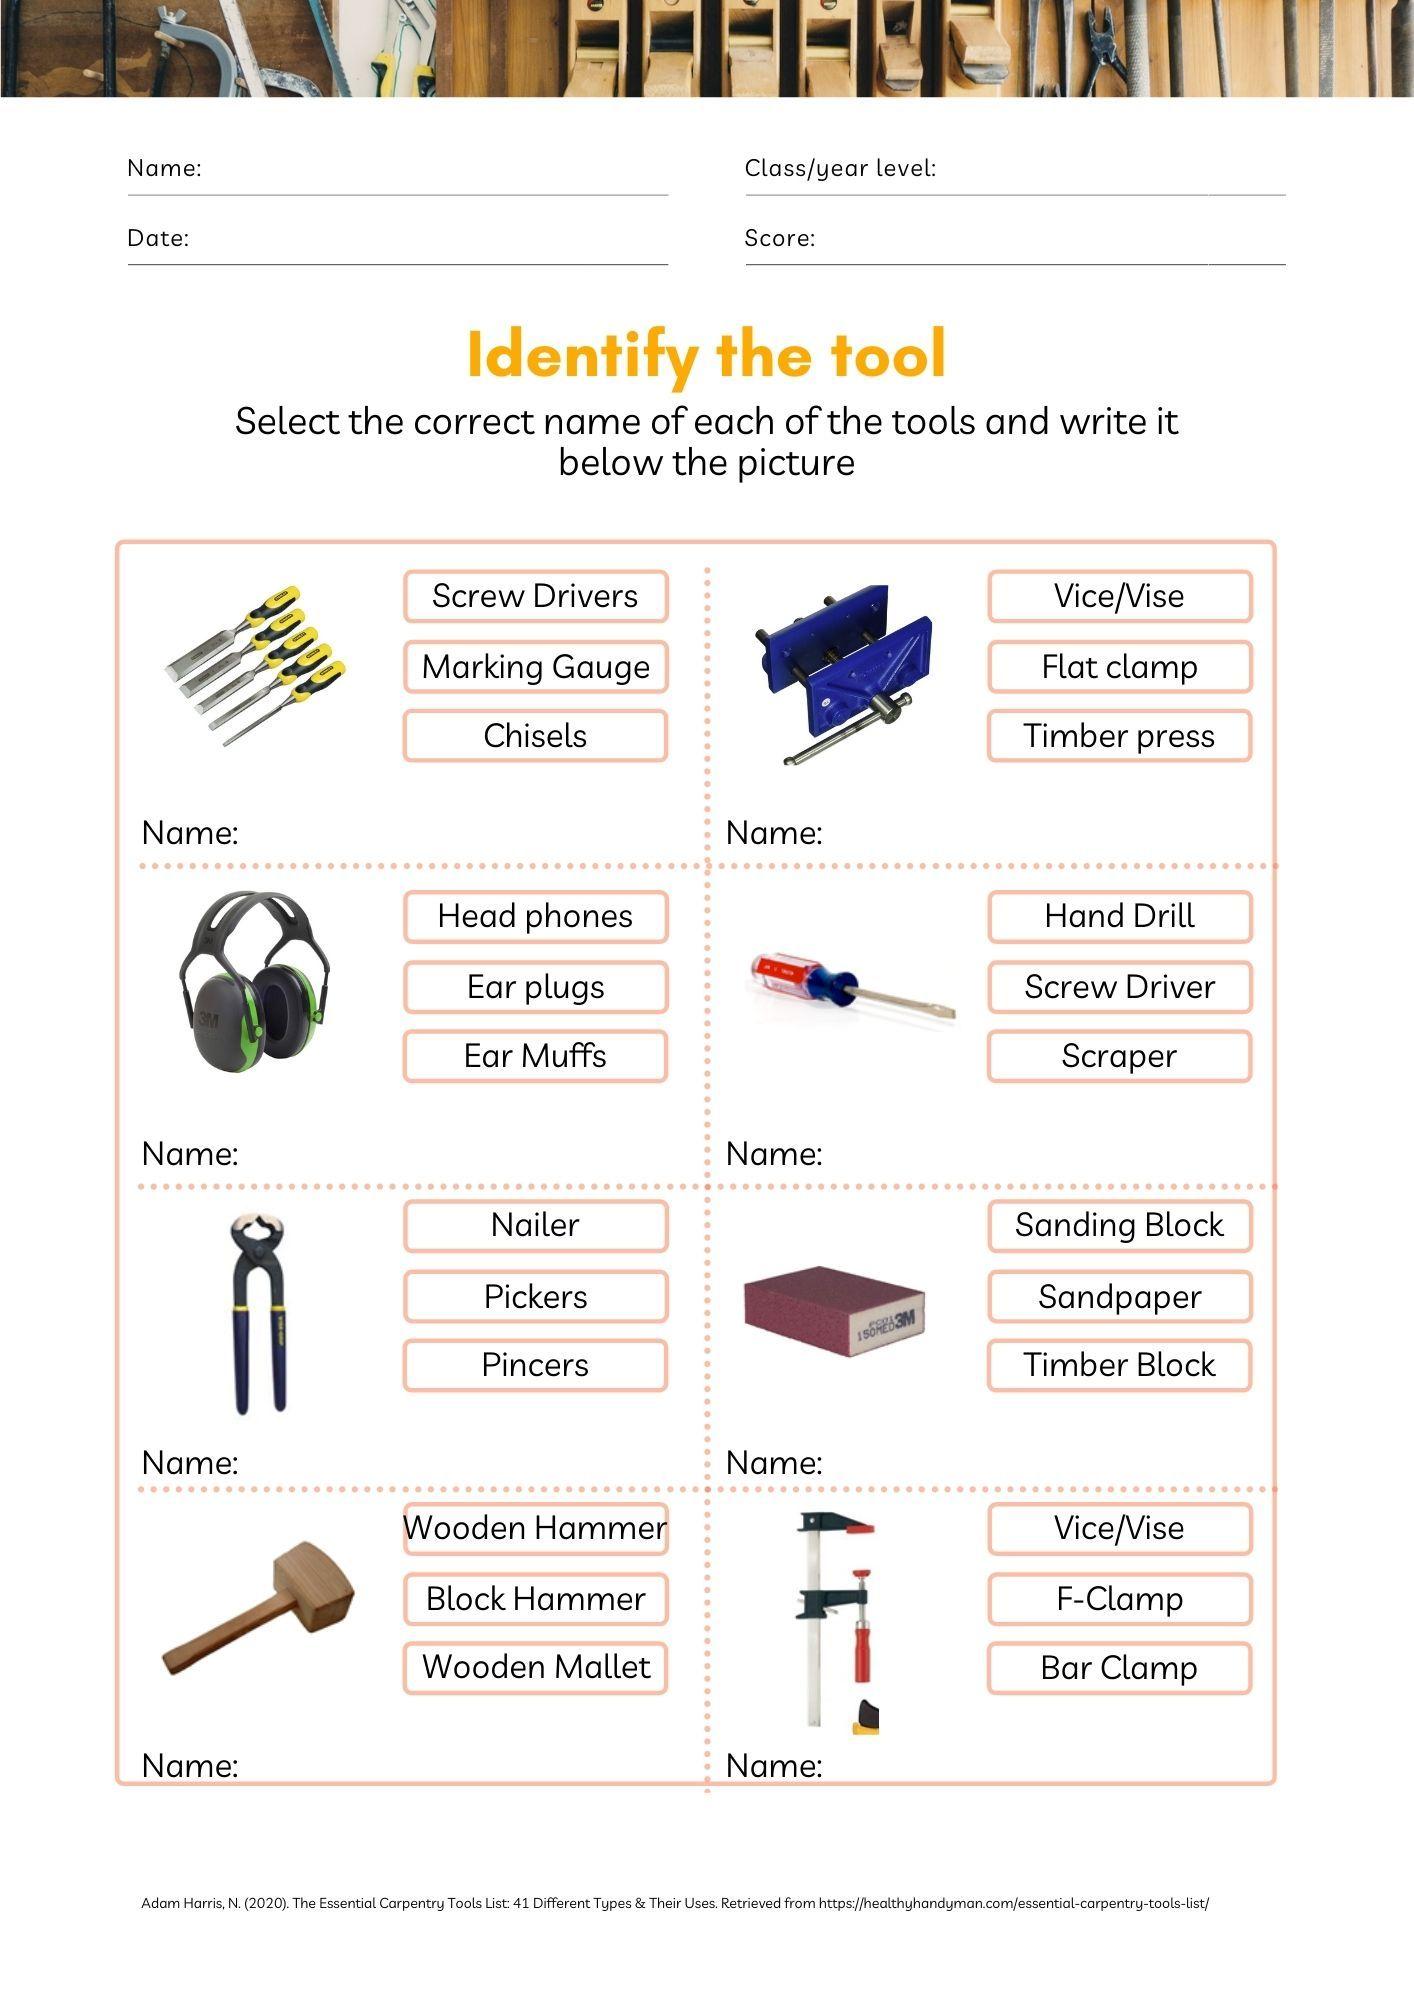 Woodworking Tools Worksheet Woodworking Tools Tools And Equipment Classroom Material [ 2000 x 1414 Pixel ]